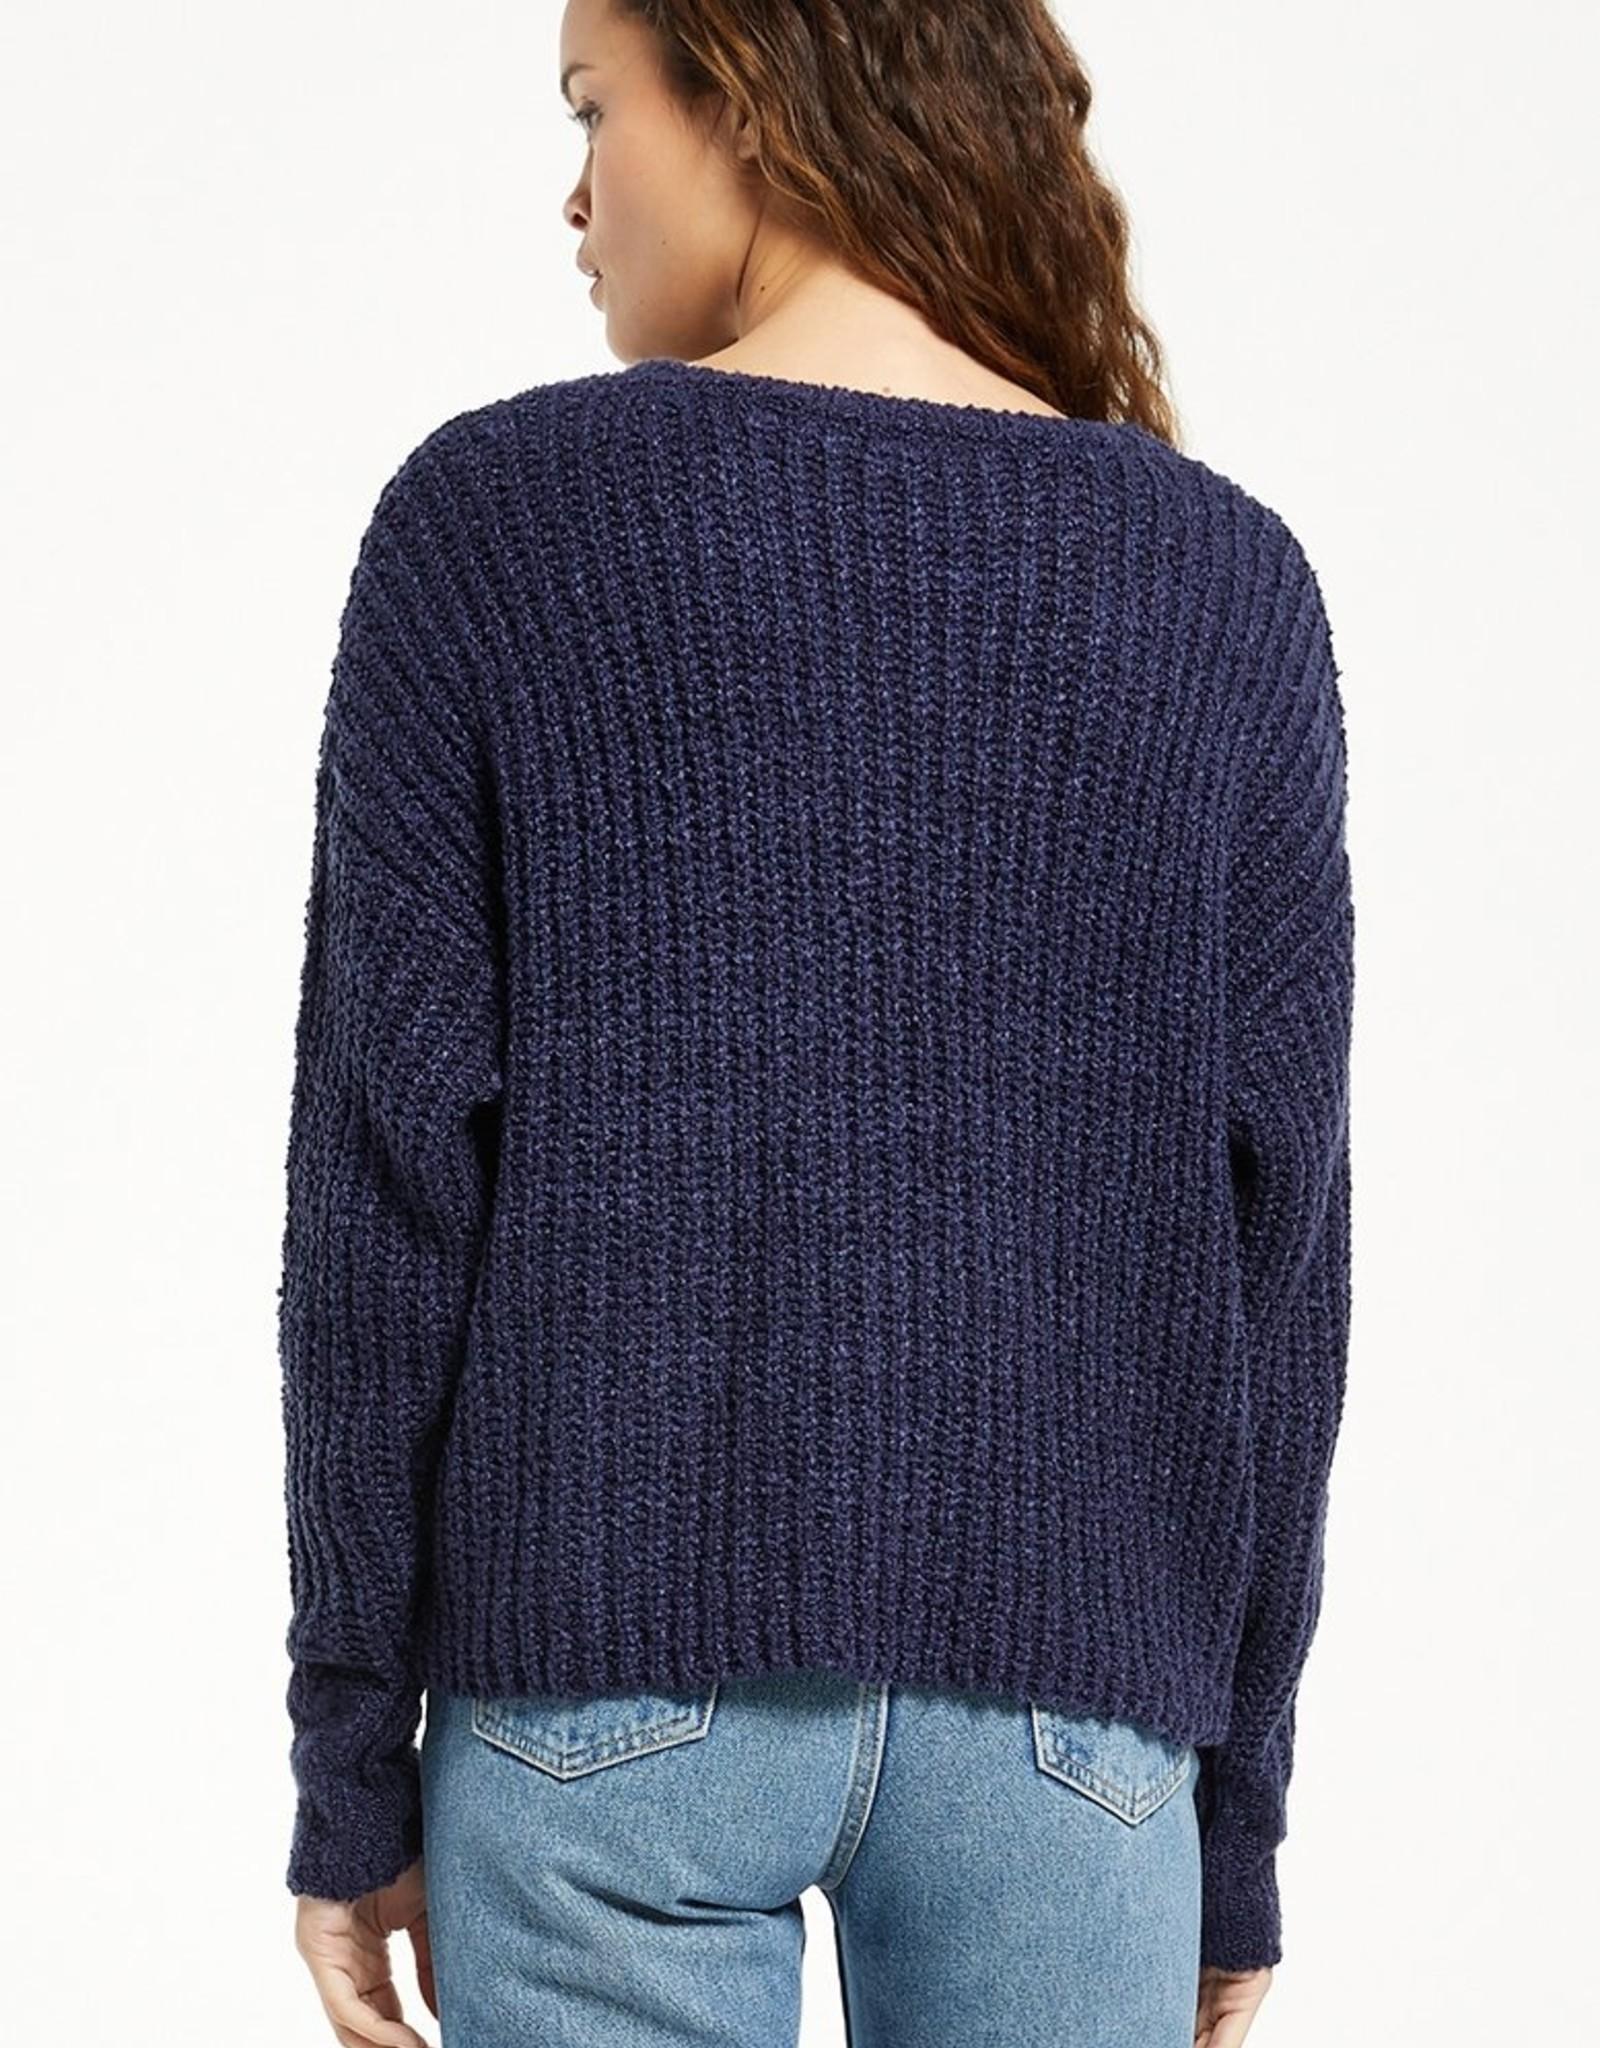 Z Supply Camden Crew Neck Sweater